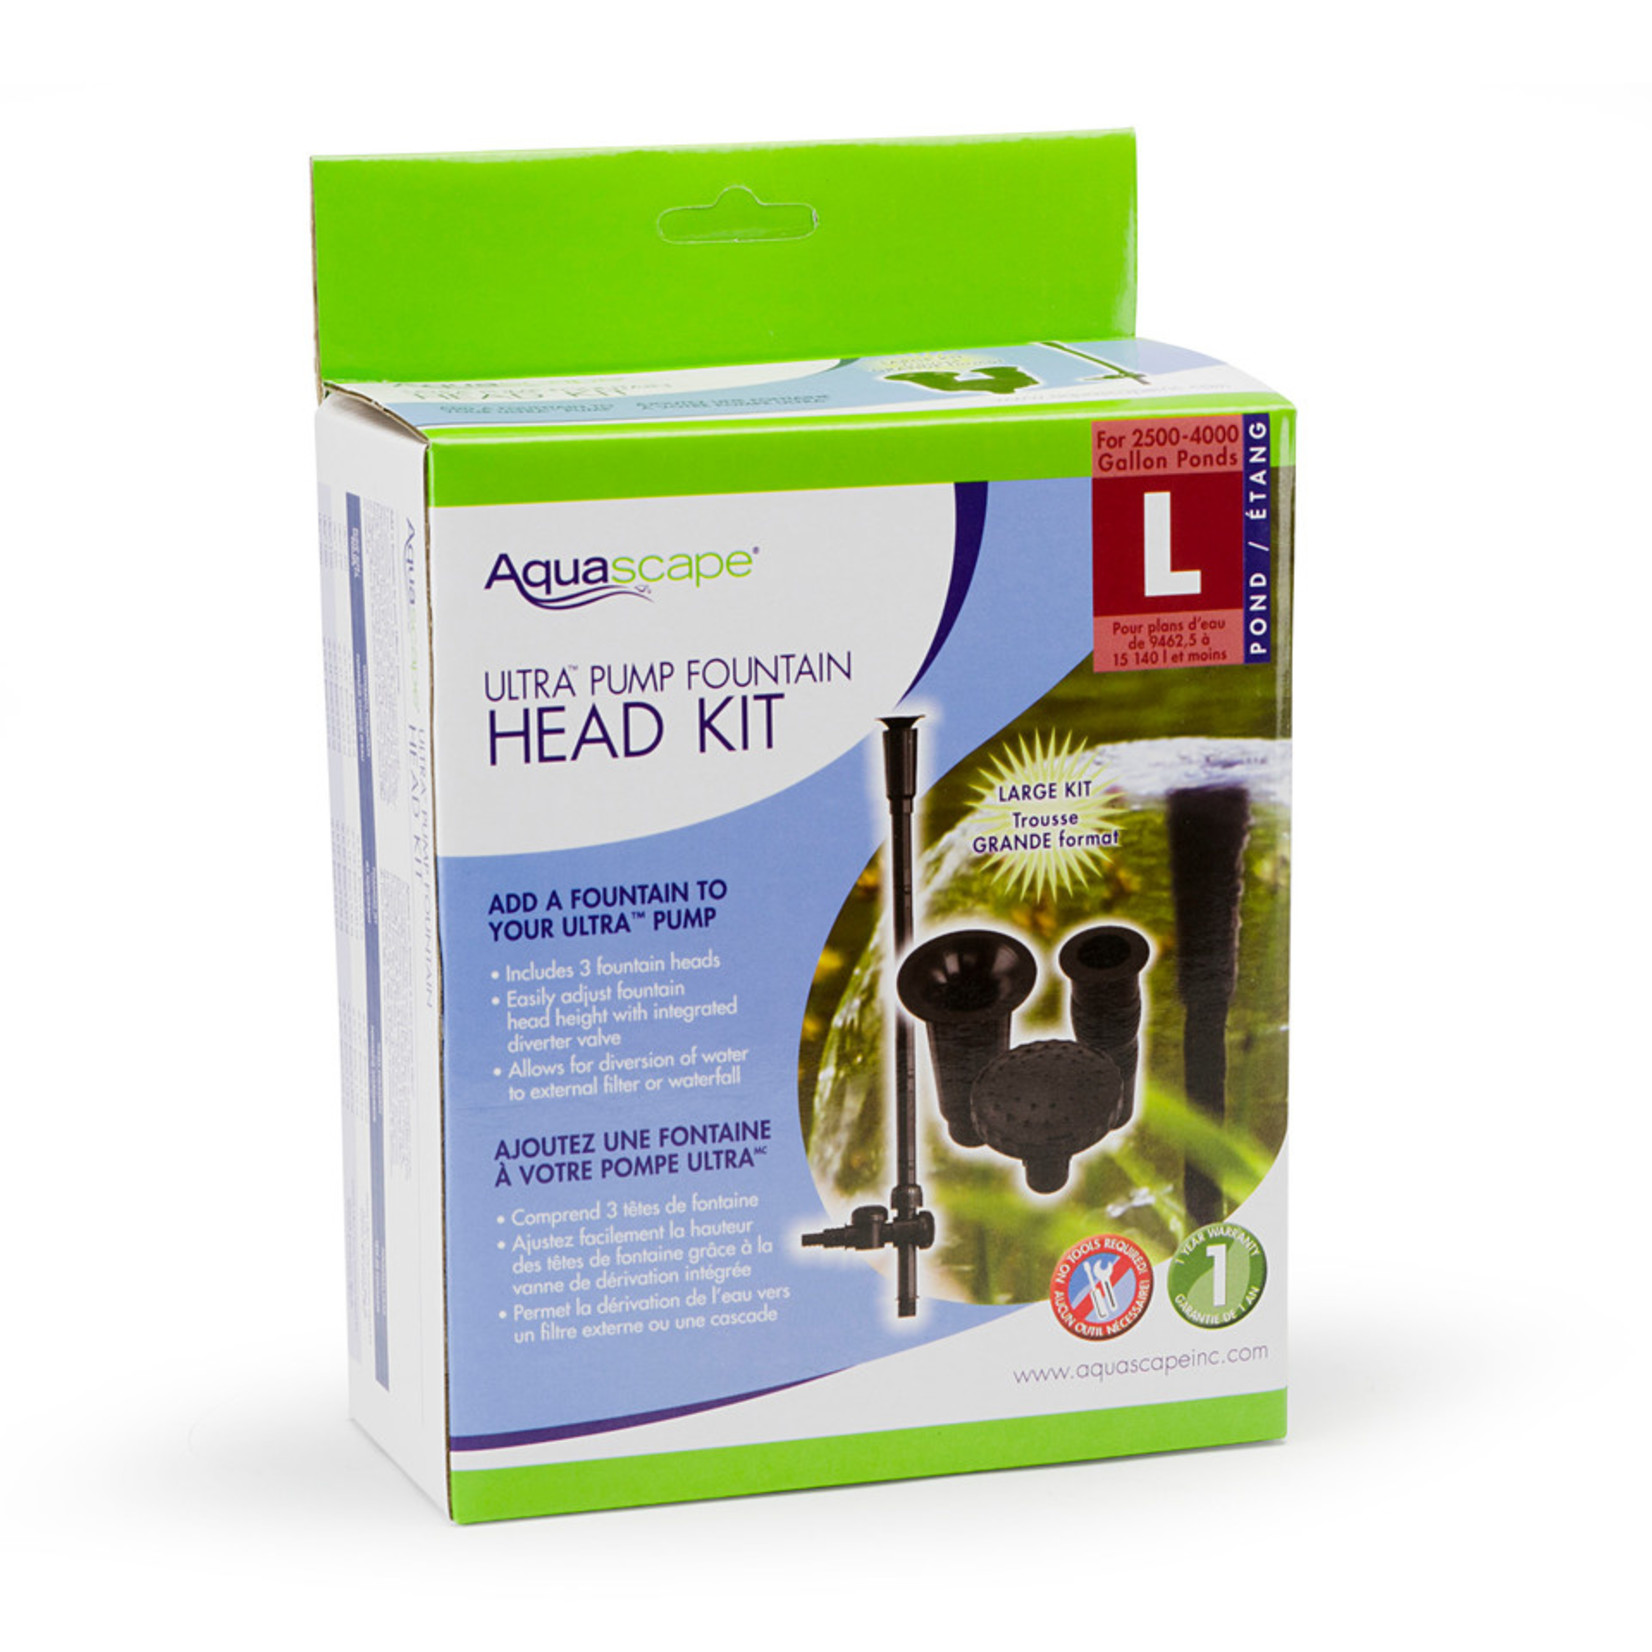 Aquascape Ultra Pump Fountain Head Kit Large